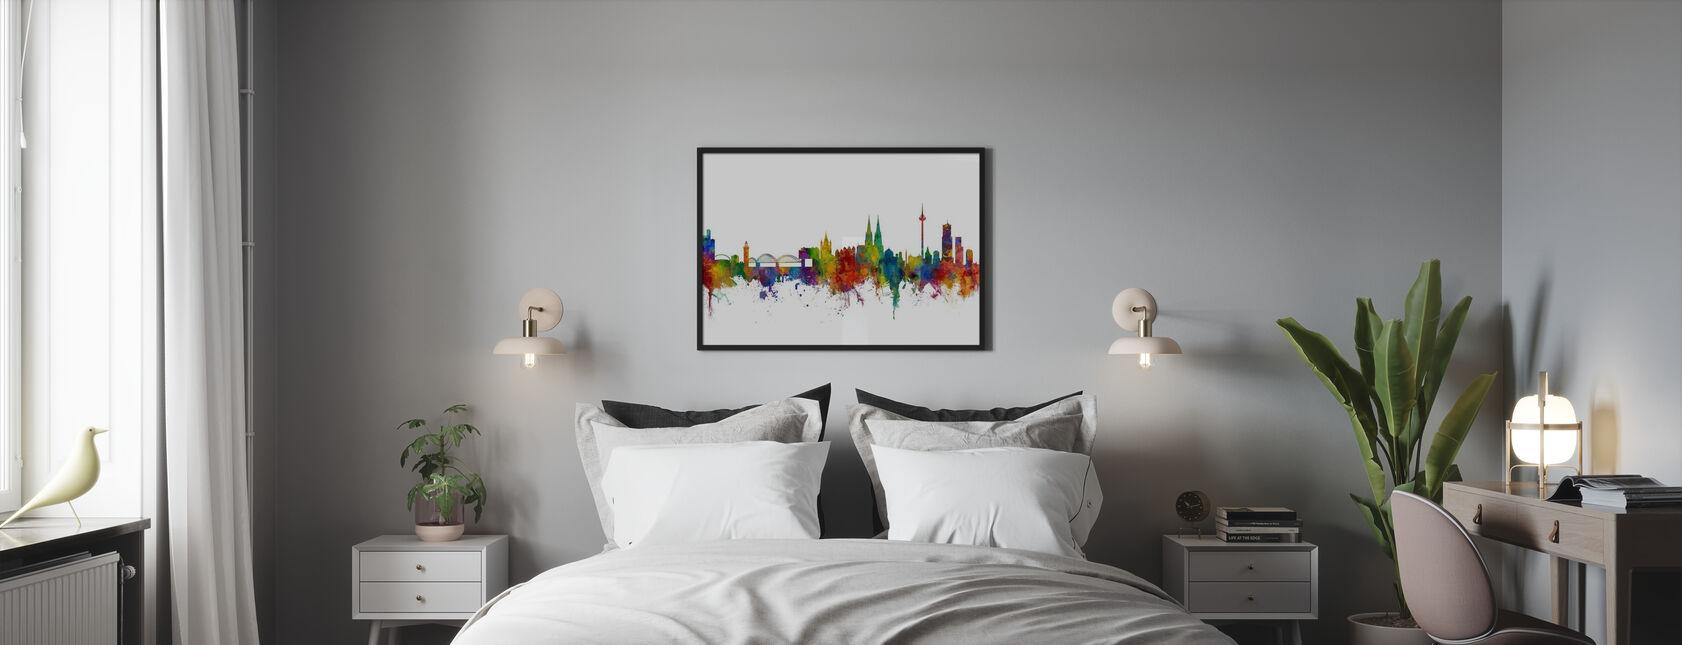 Skyline Köln - Poster - Schlafzimmer